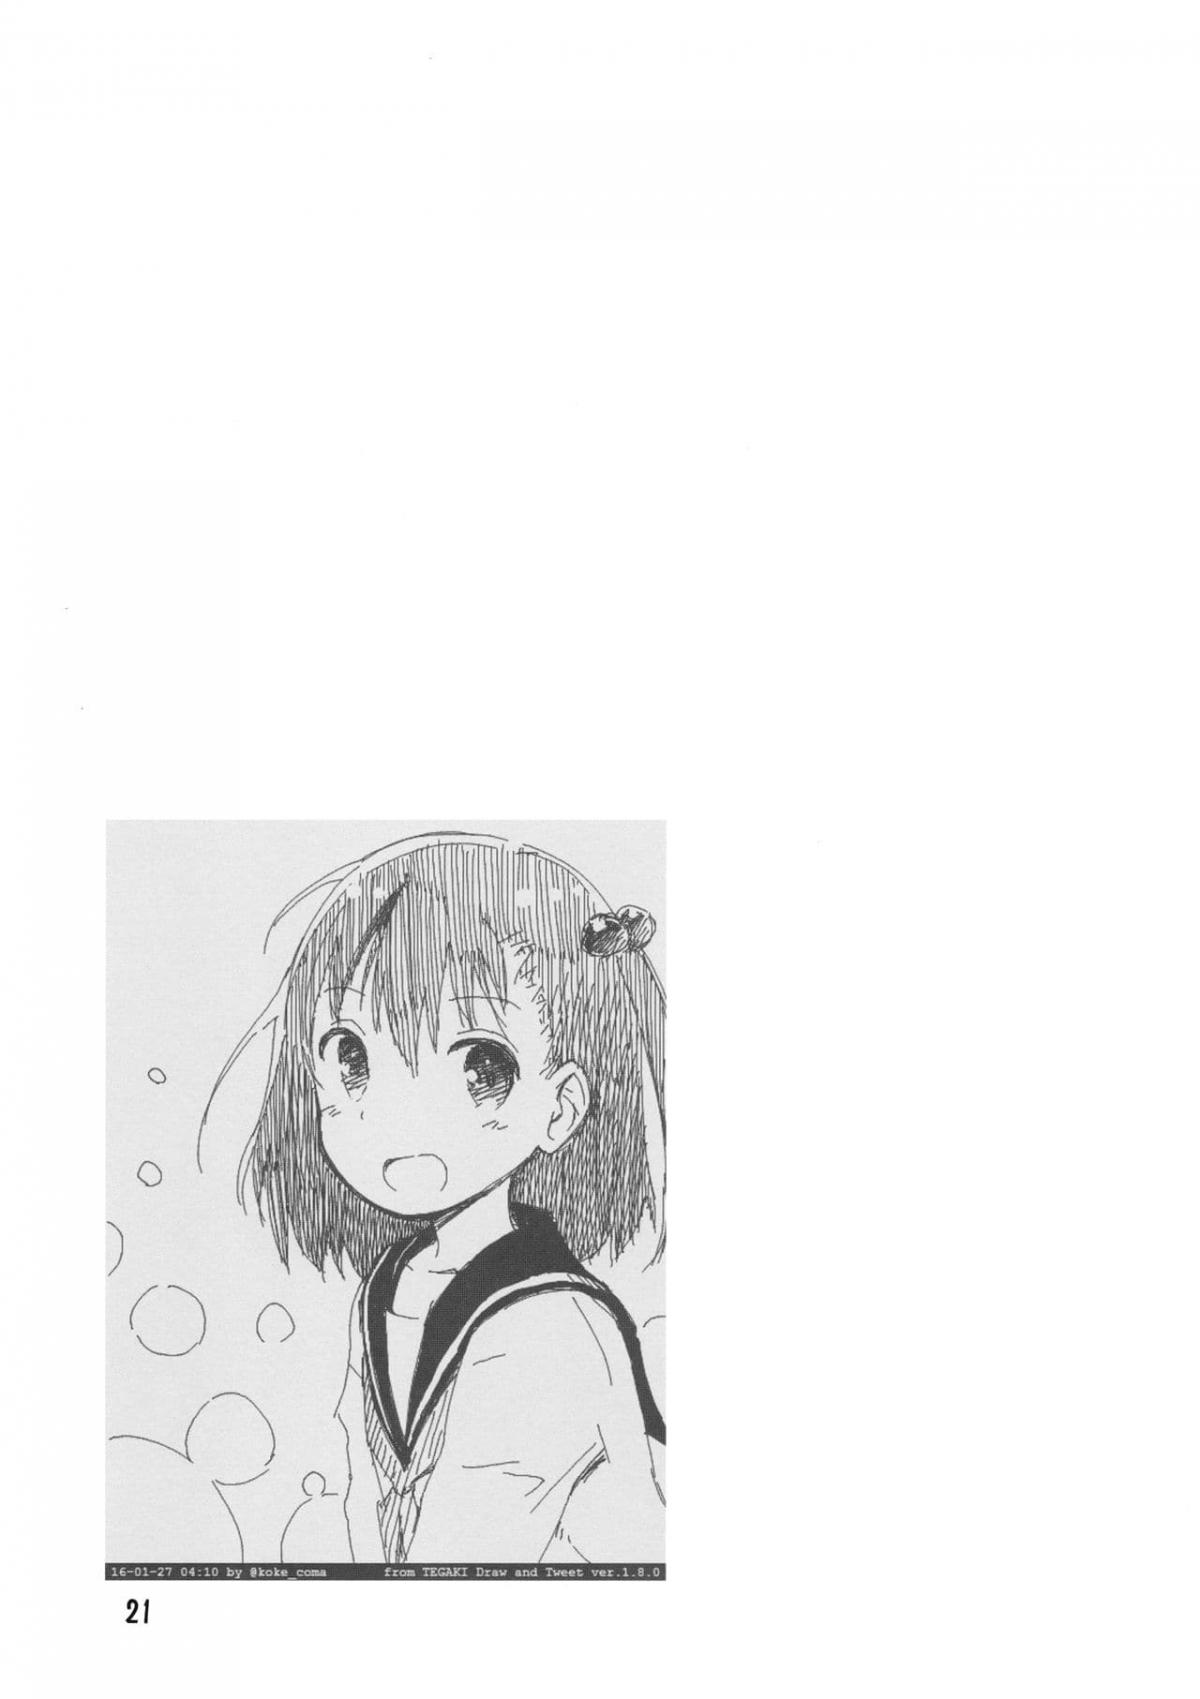 Hình ảnh  in Hentai Hiếp Dâm Loạn Luân Ooya san wa dainiji seichouki